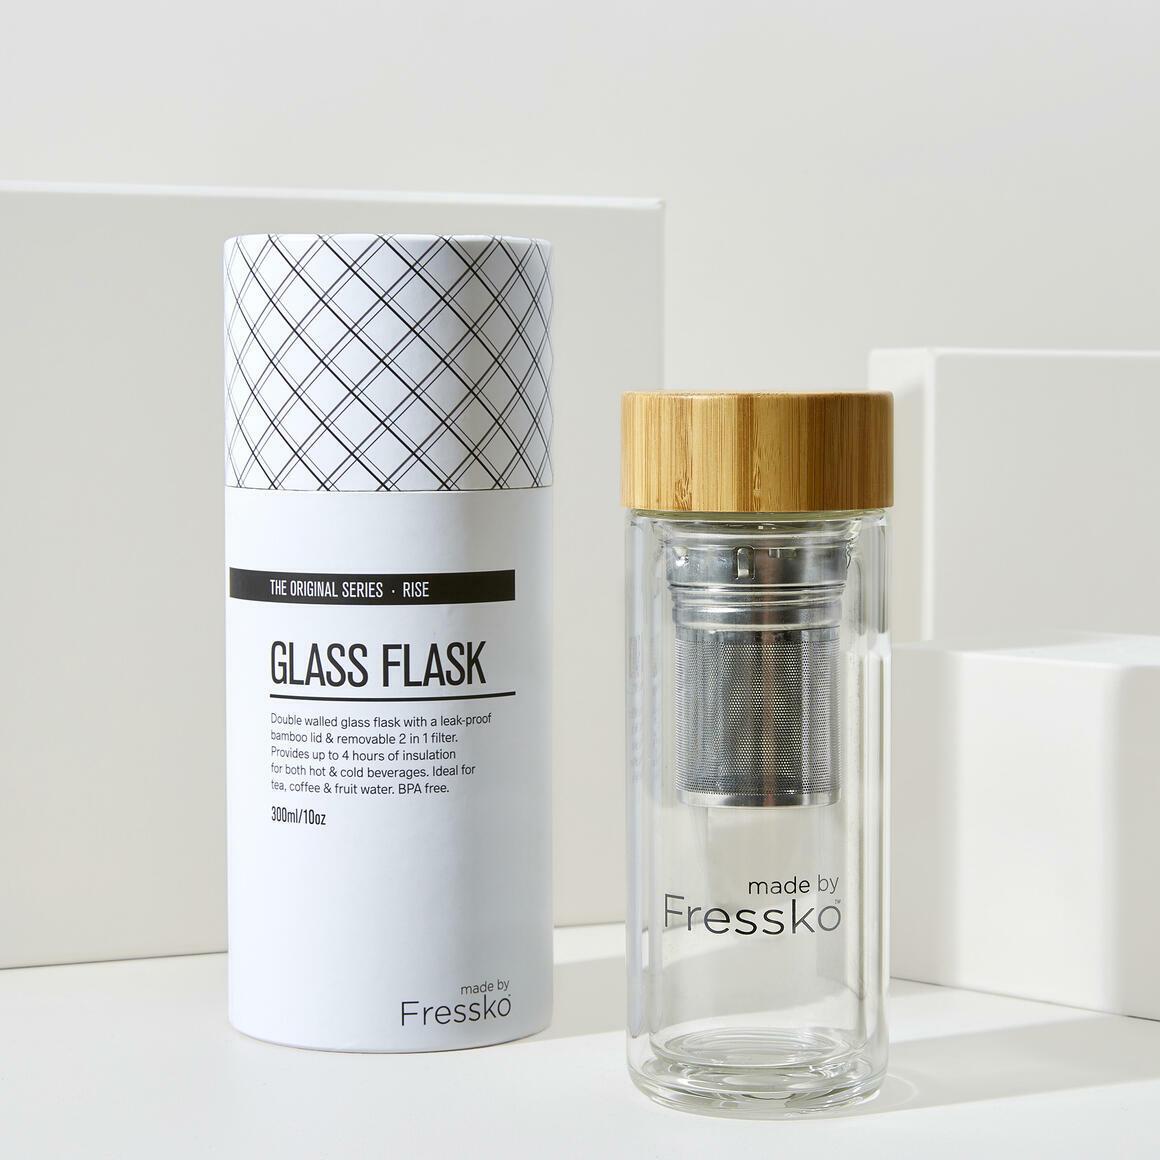 Fressko RISE 300ml Glass Flask + 2 in 1 infuser | Trada Marketplace